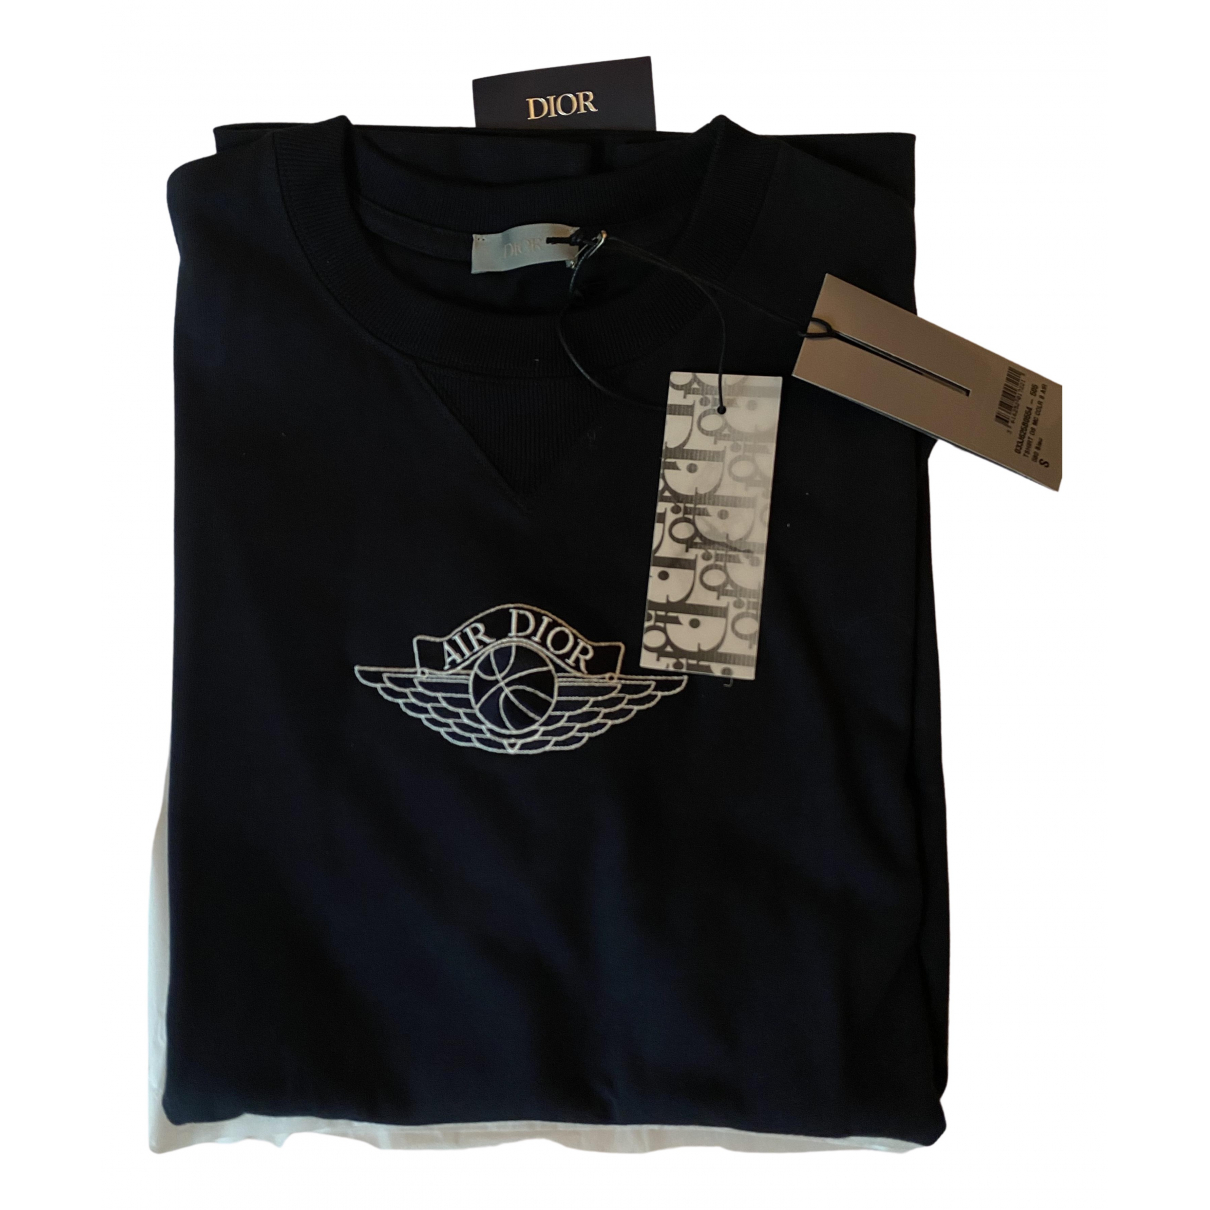 Jordan X Dior - Tee shirts   pour homme en coton - bleu